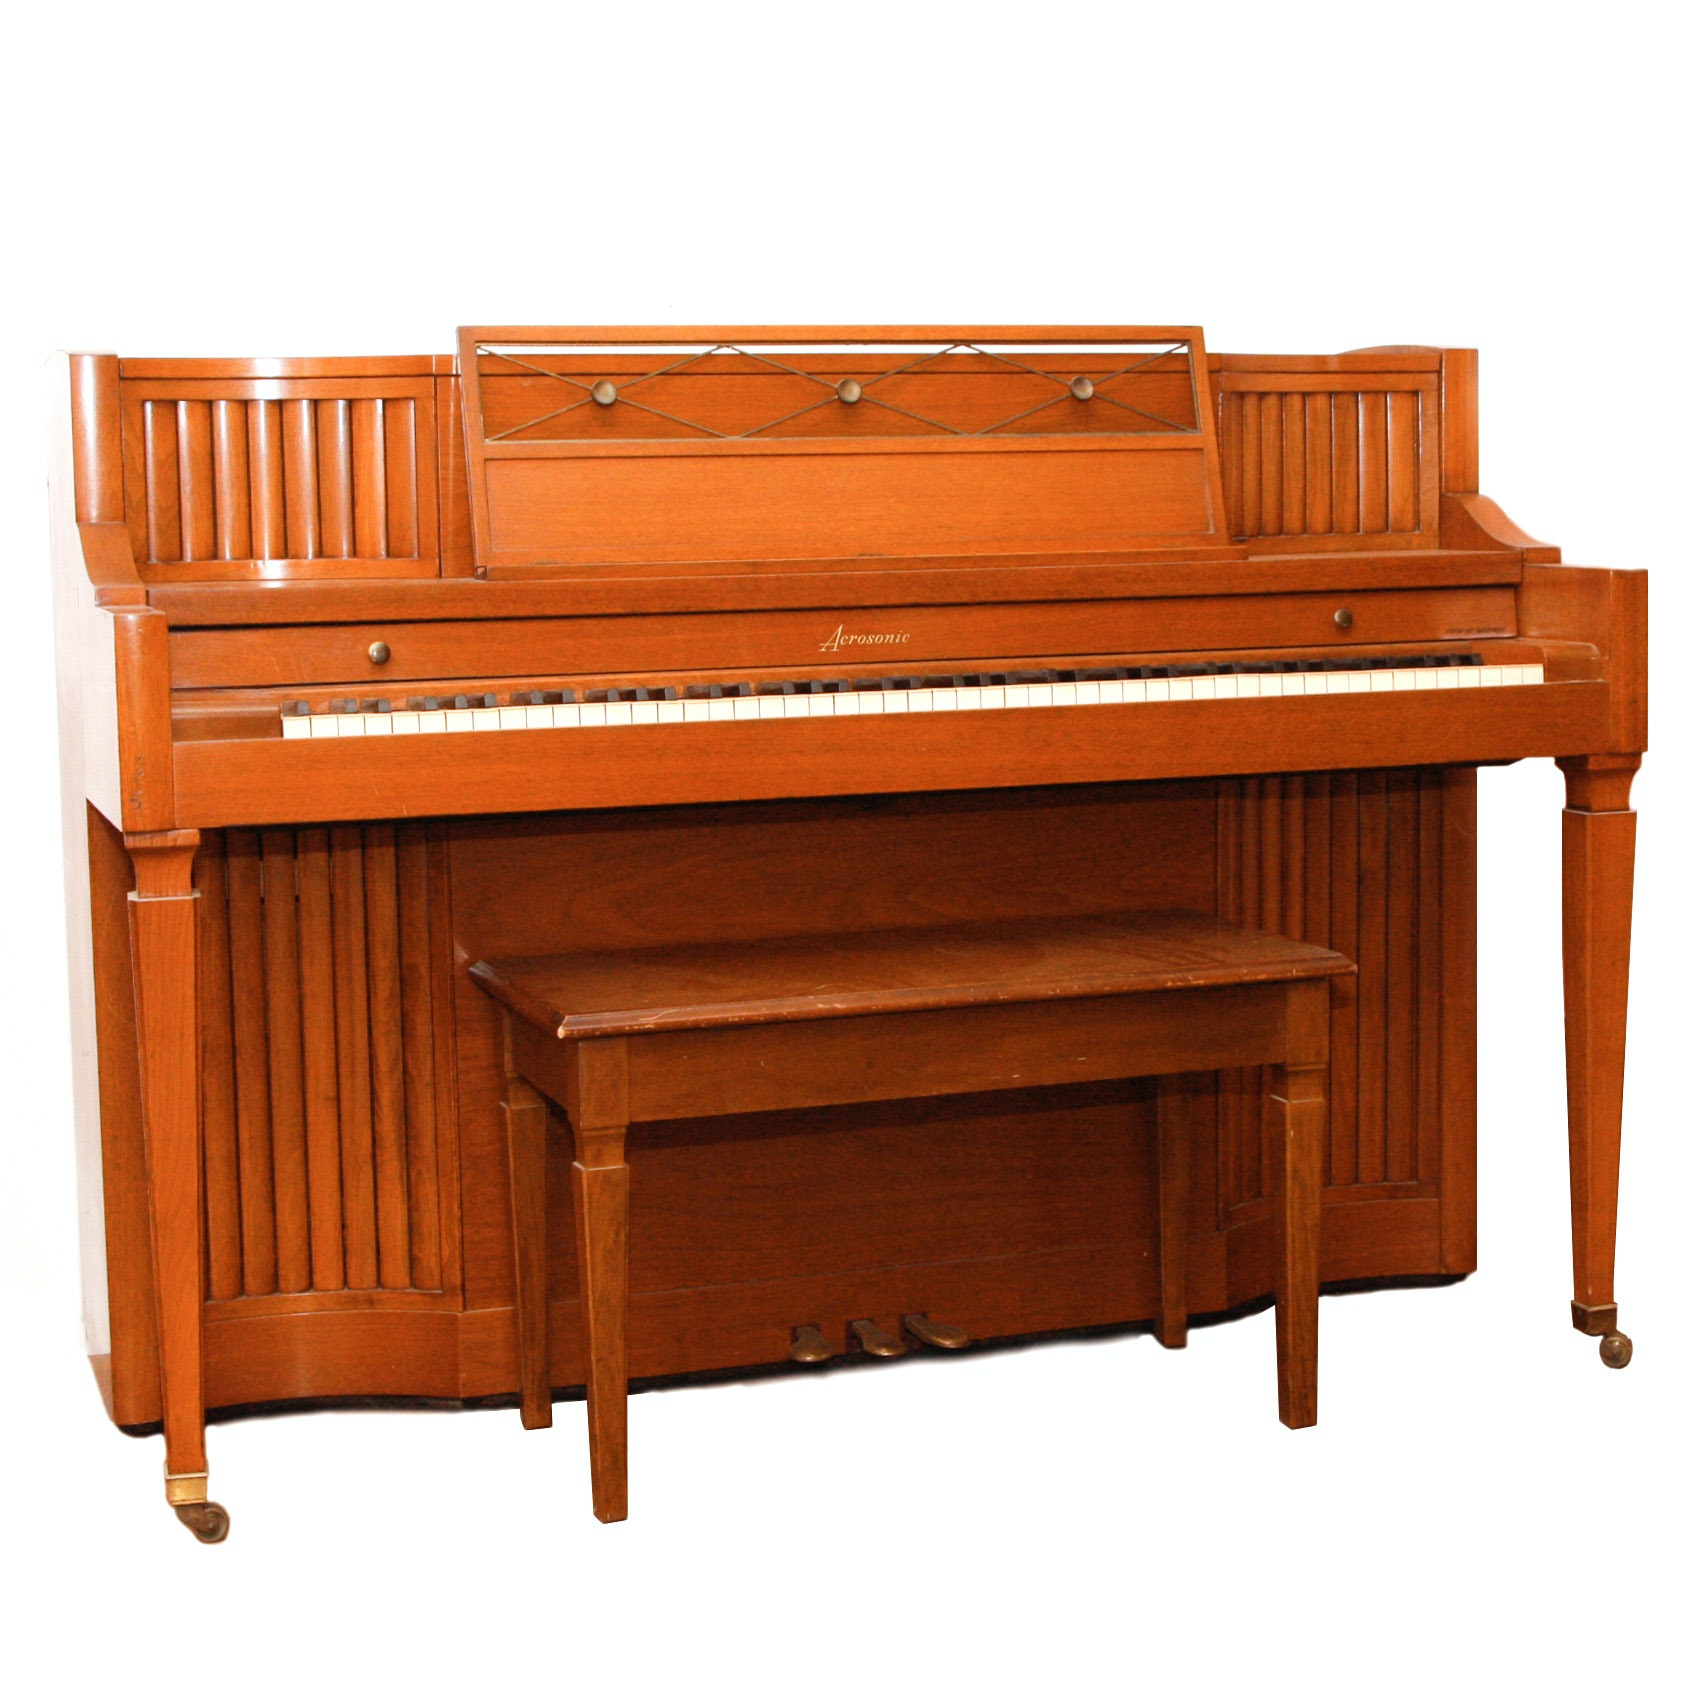 Baldwin Acrosonic Console Piano and Bench